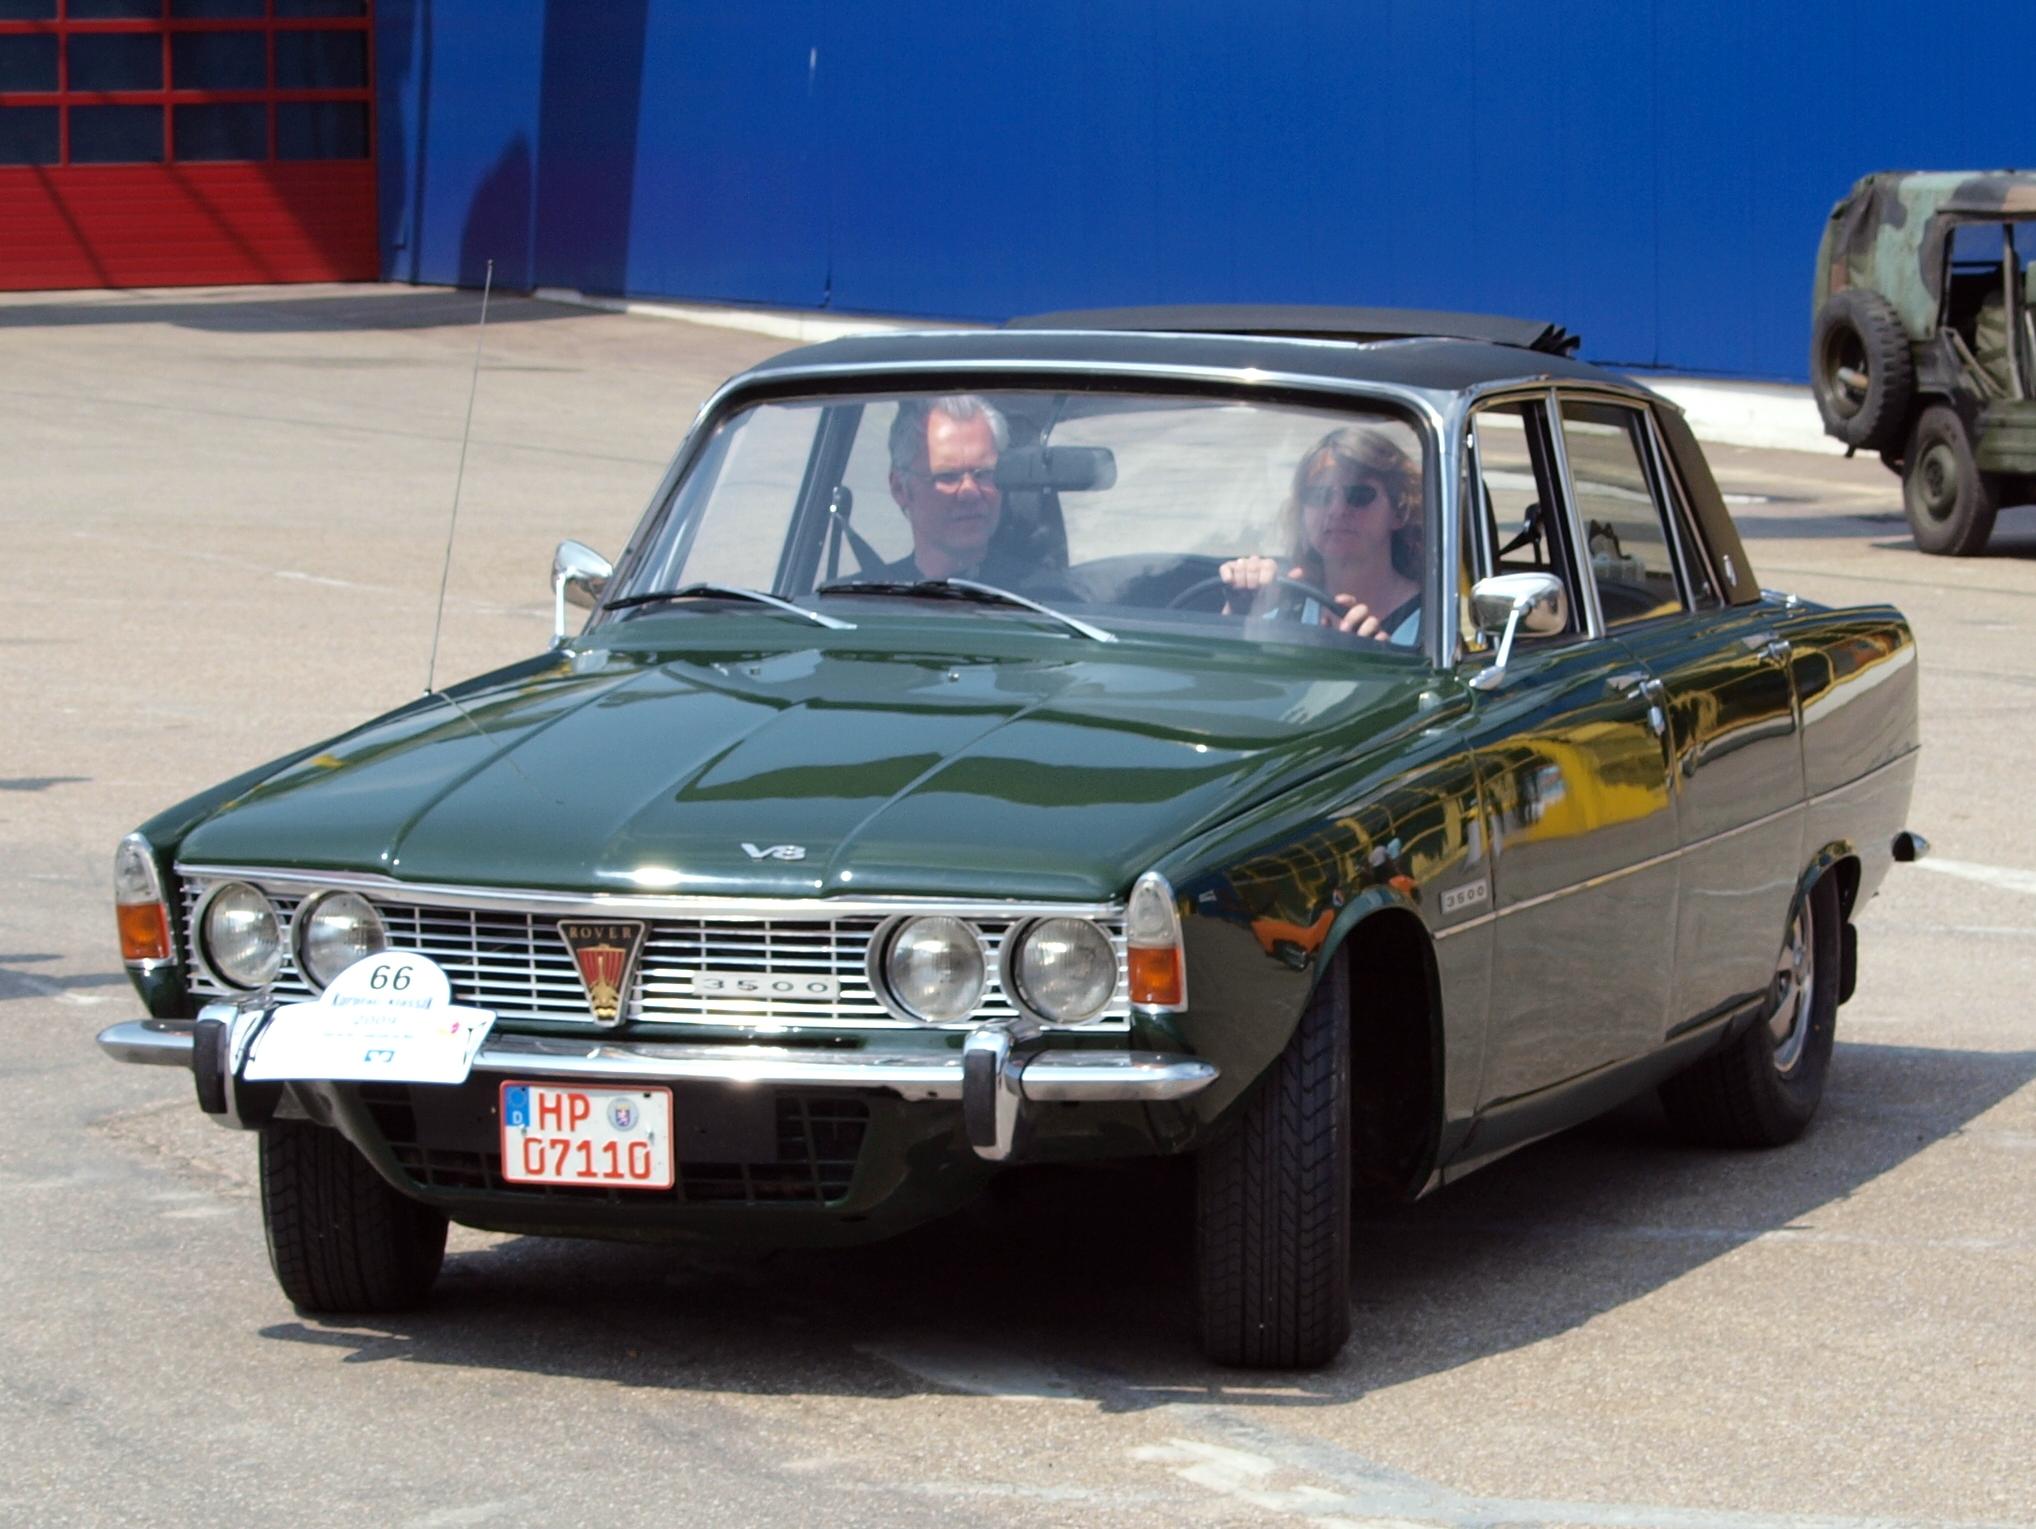 File Rover P6 3500 V8 1970 p2 JPG Wikimedia mons